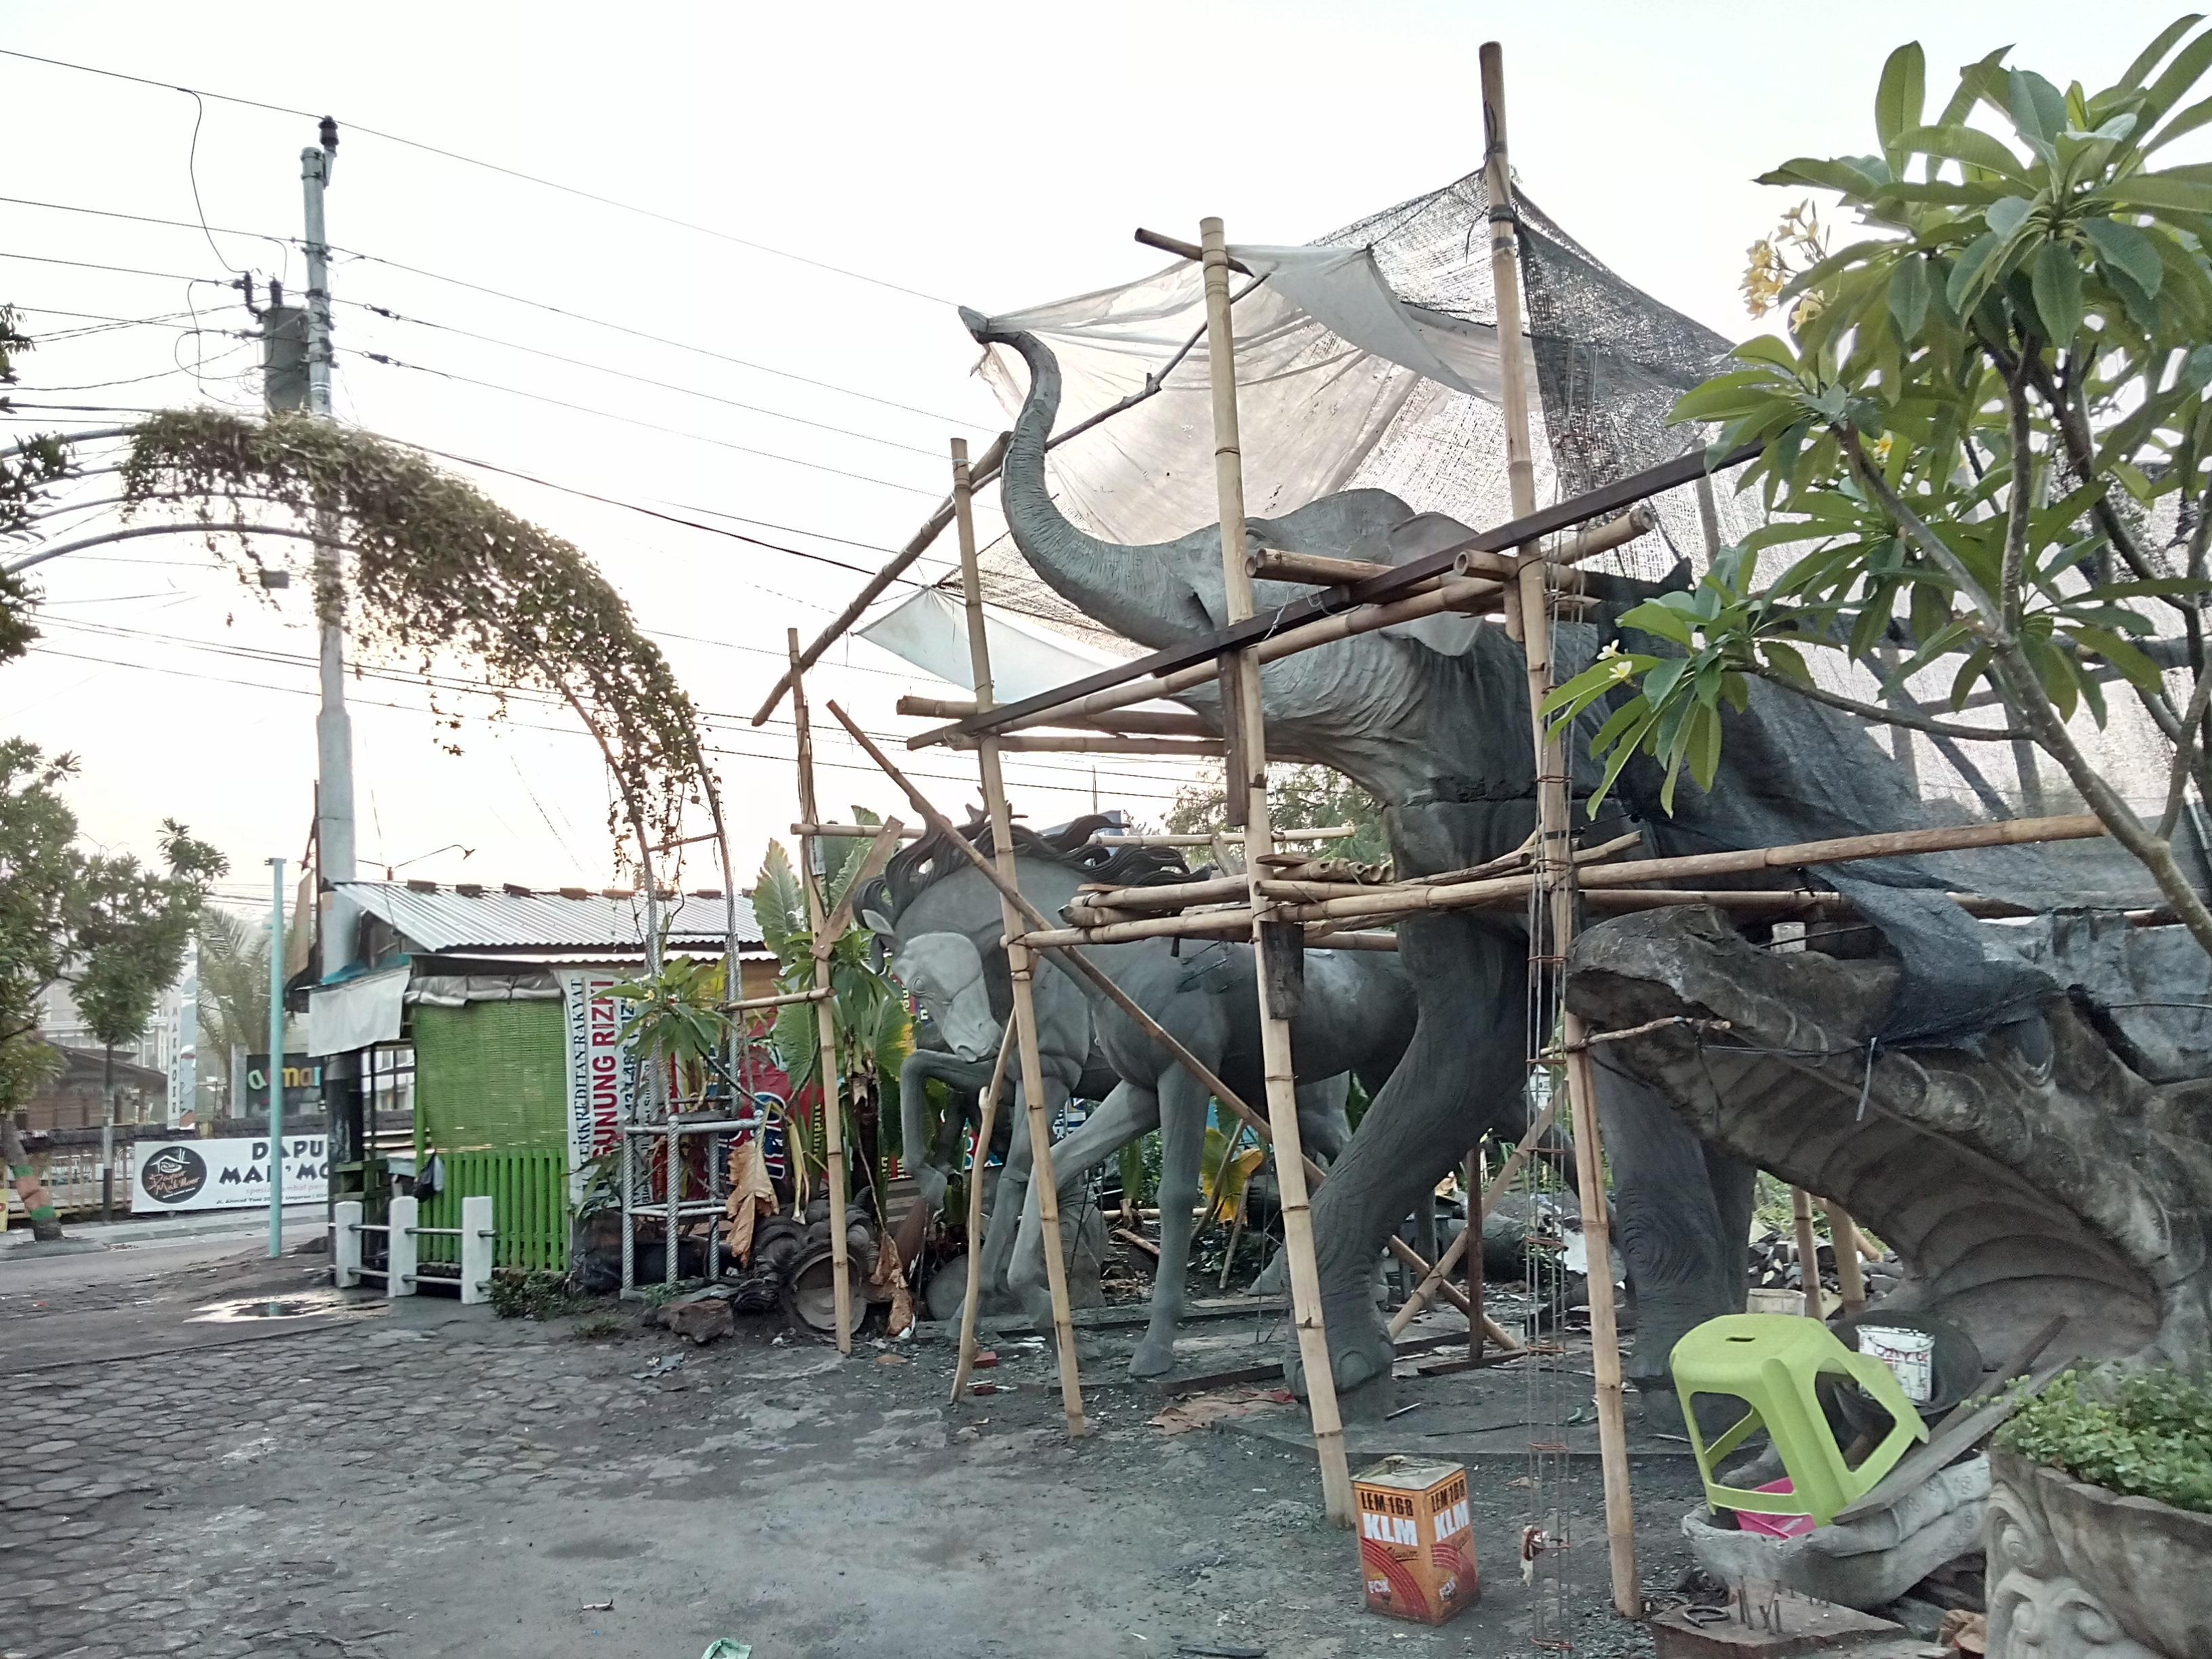 Leonardokrisna Gang Patung Ungaran Sanggar Seni Gedong Songo Kab Semarang